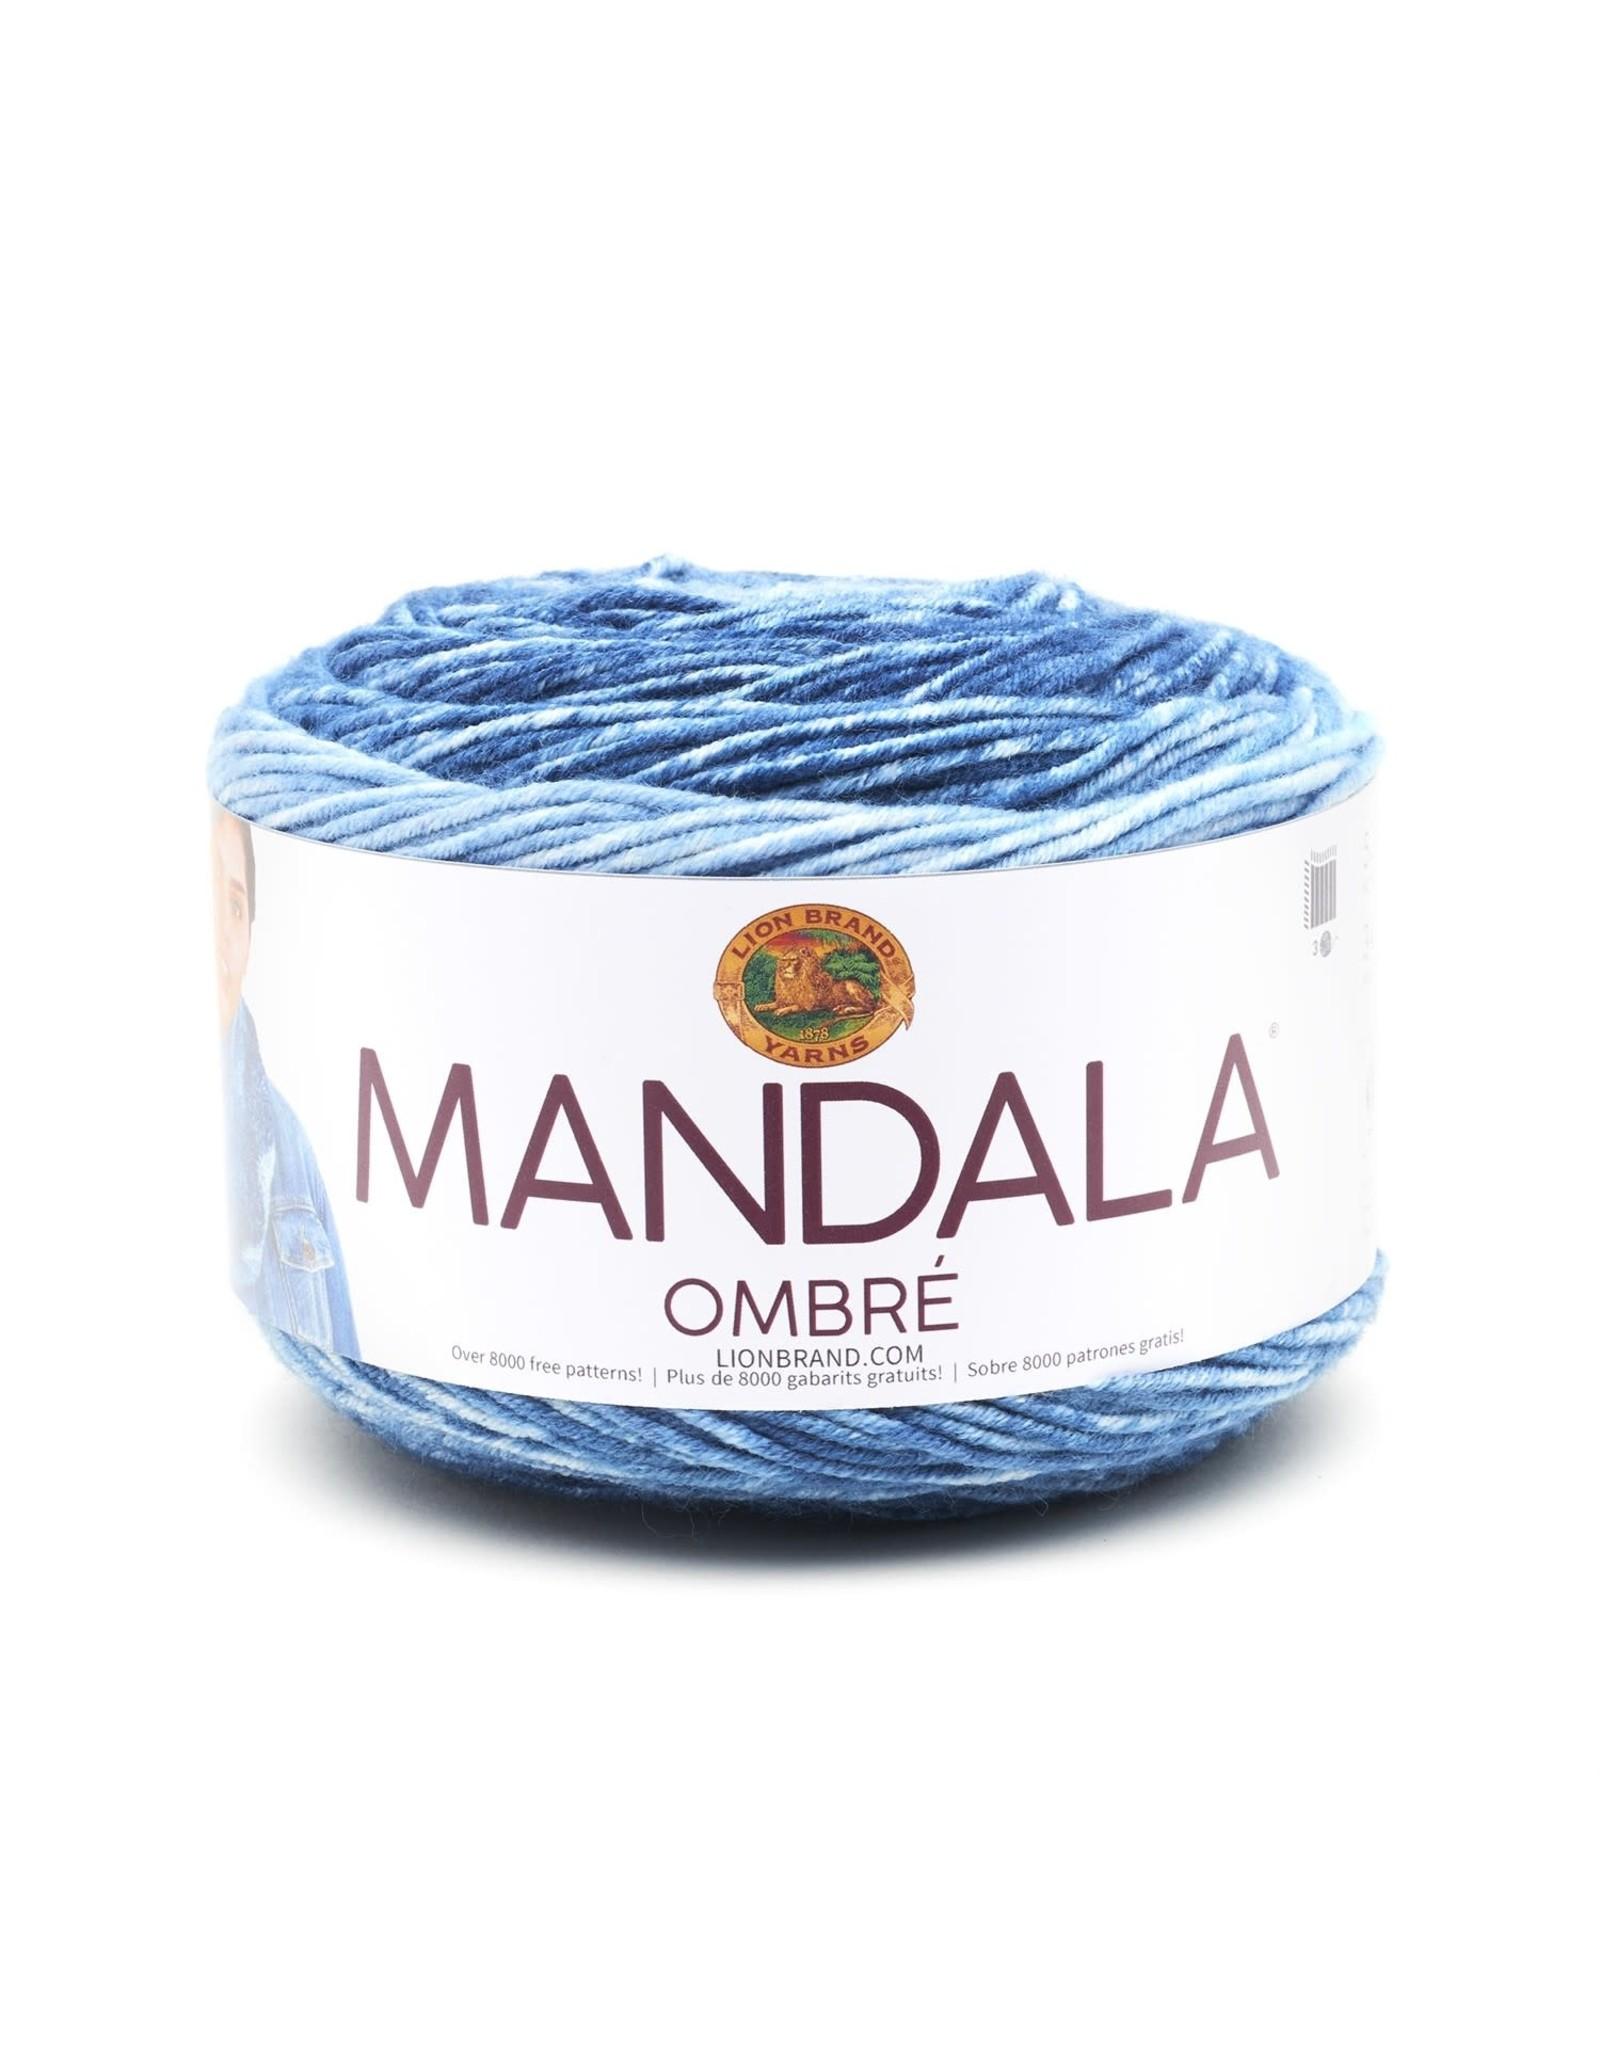 Harmony - Mandala Ombre - Lion Brand